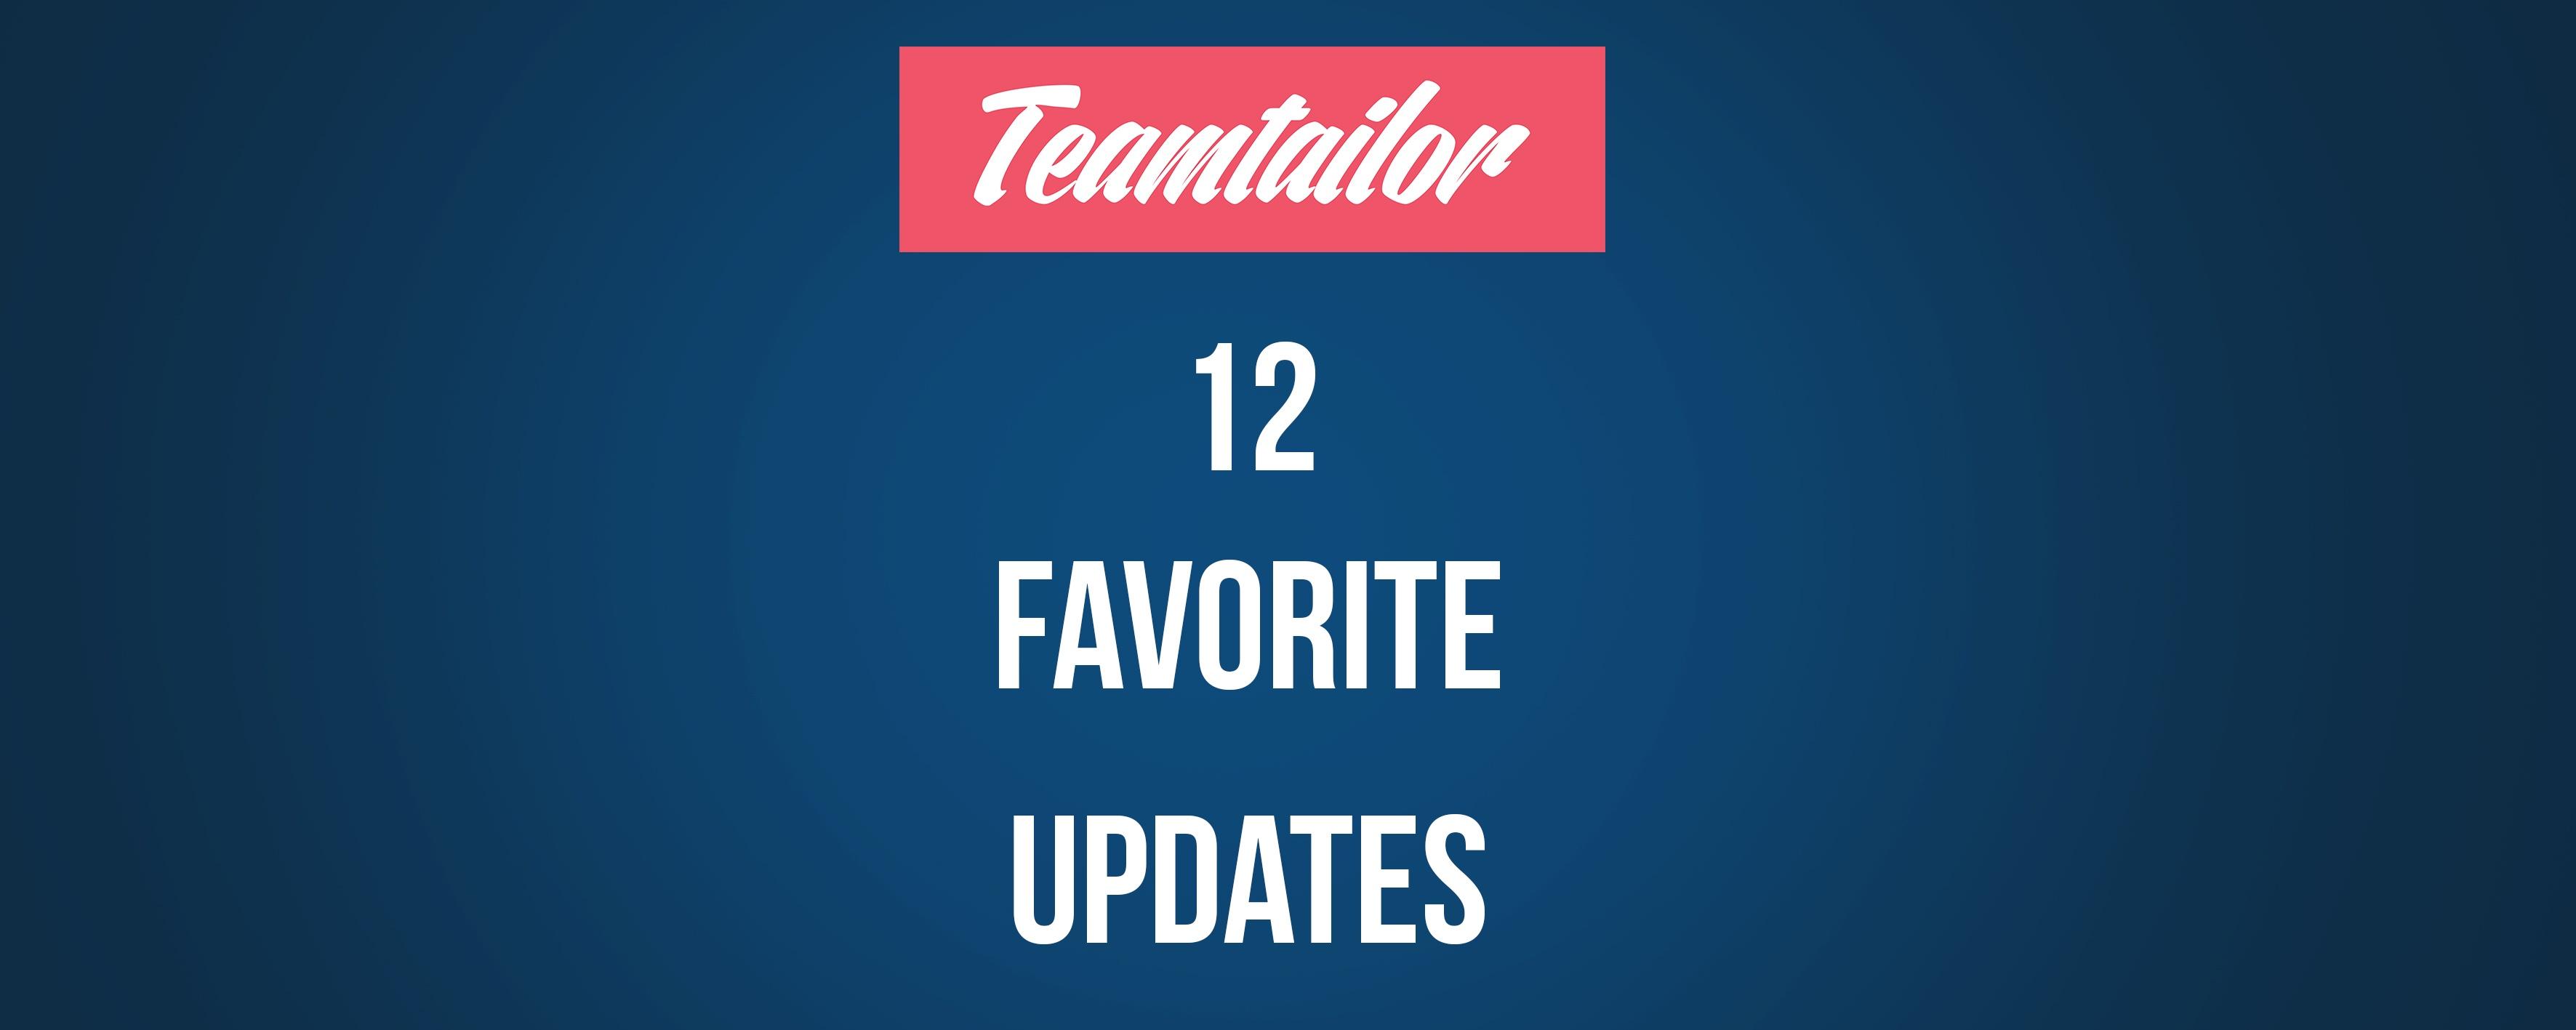 12 favorite updates.jpg